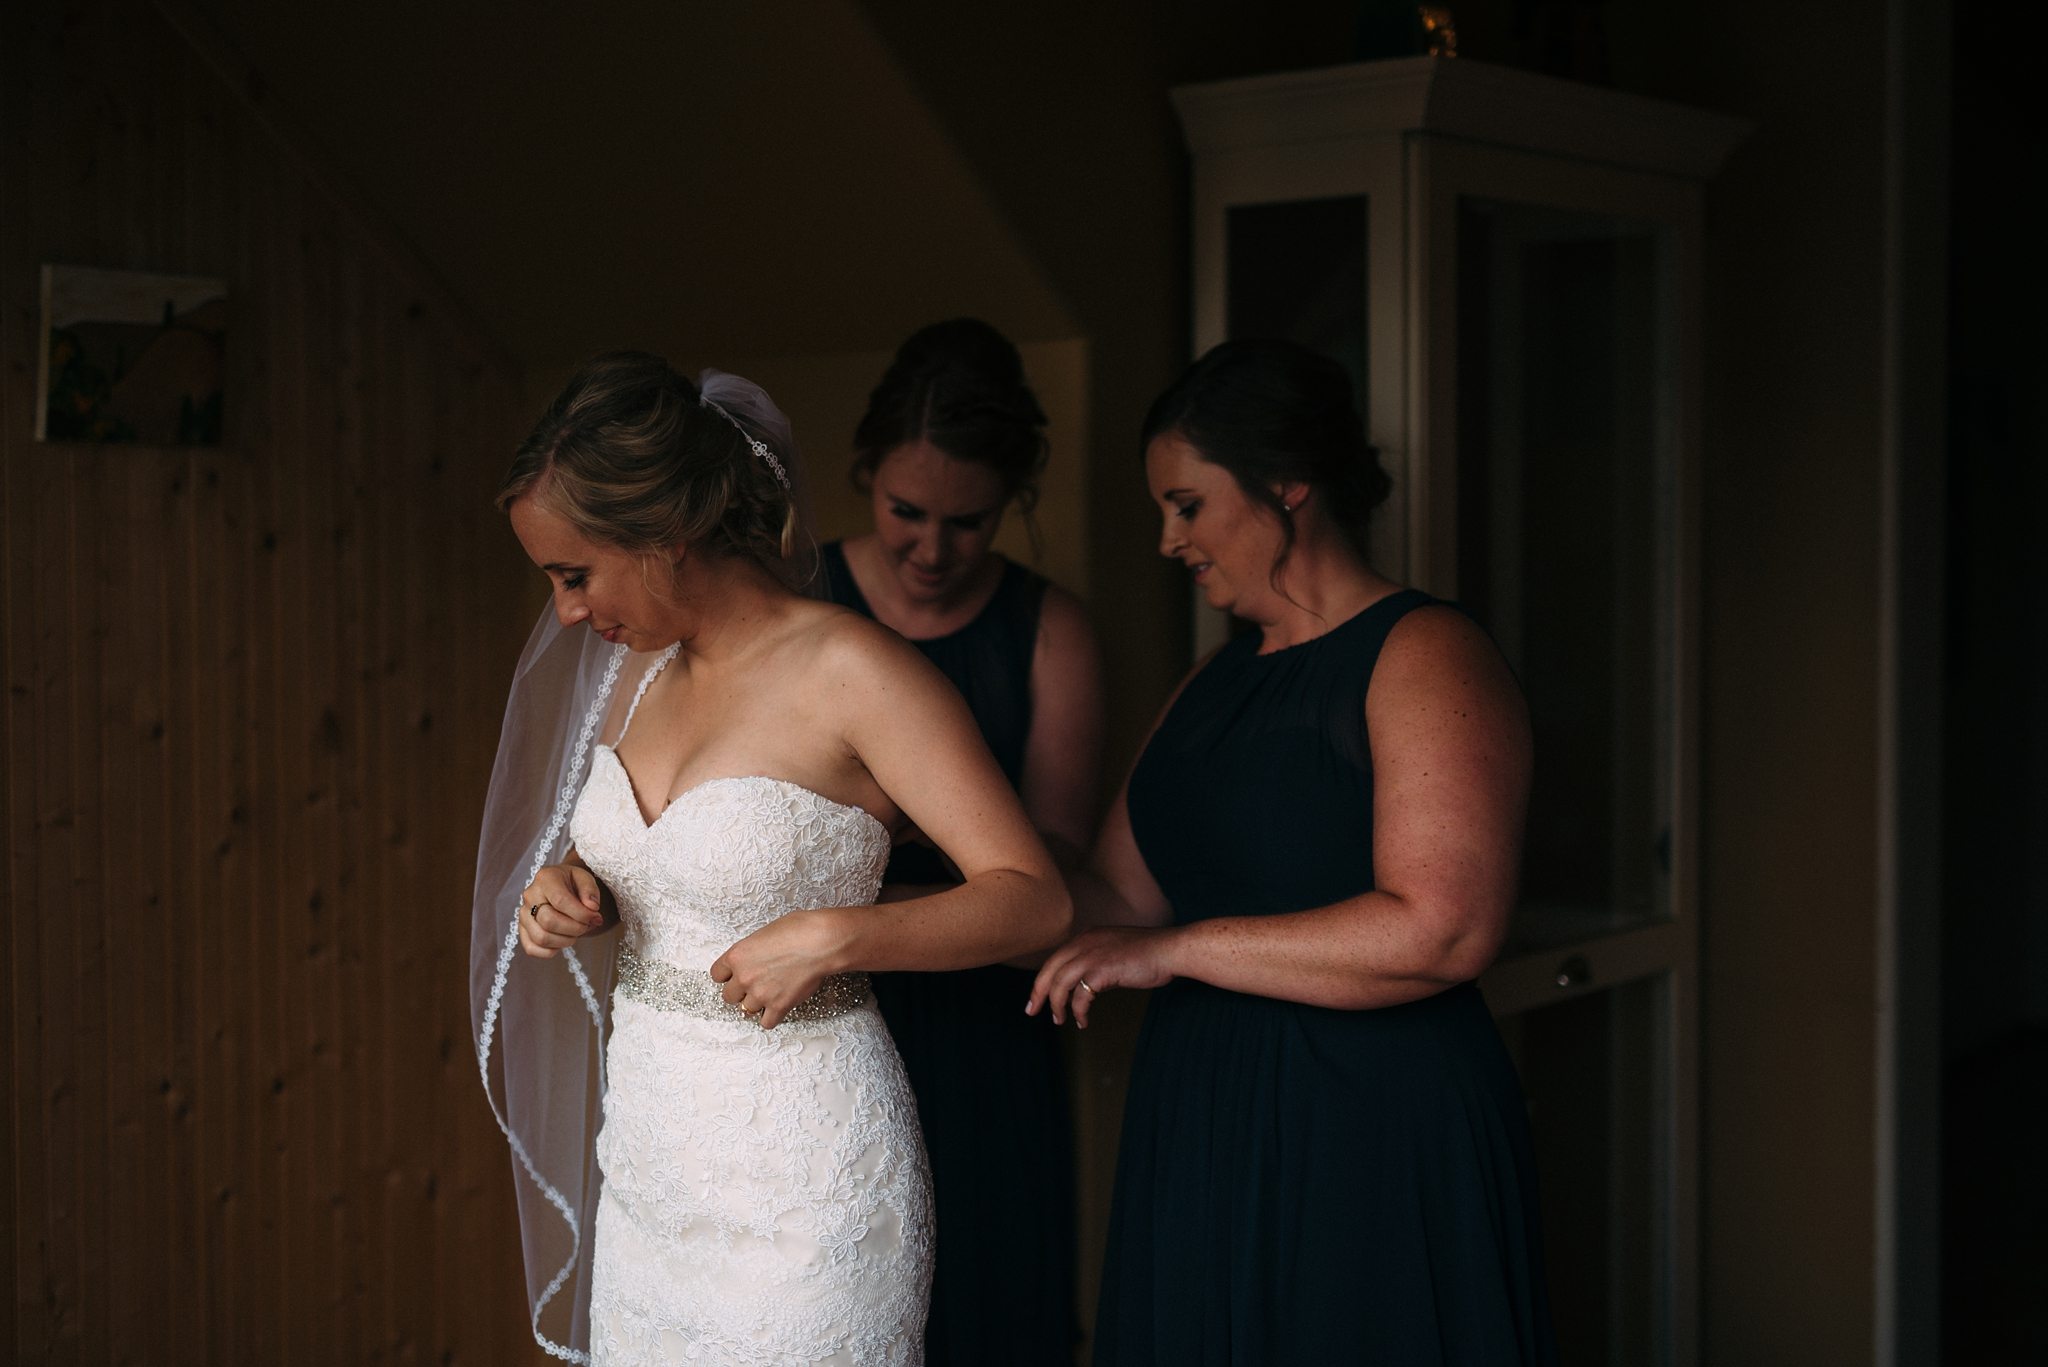 kaihla_tonai_intimate_wedding_elopement_photographer_4291